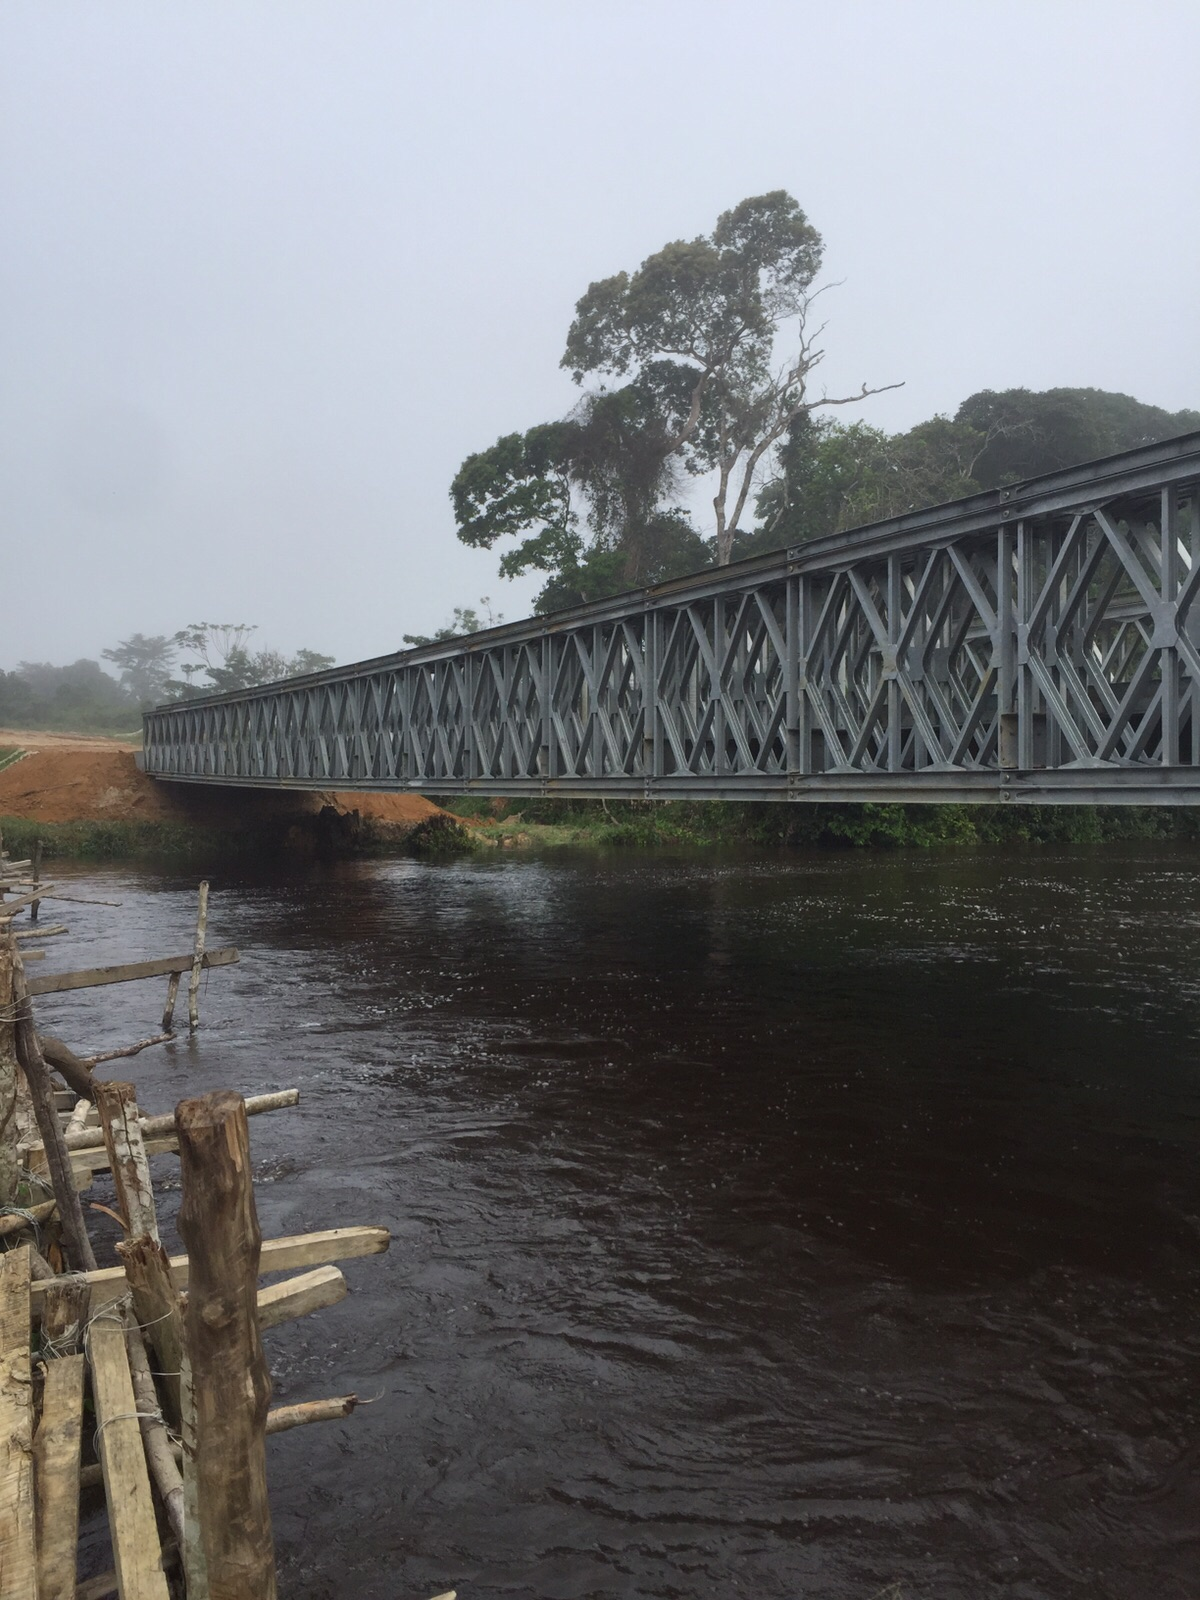 Briges | Ponts - Africa